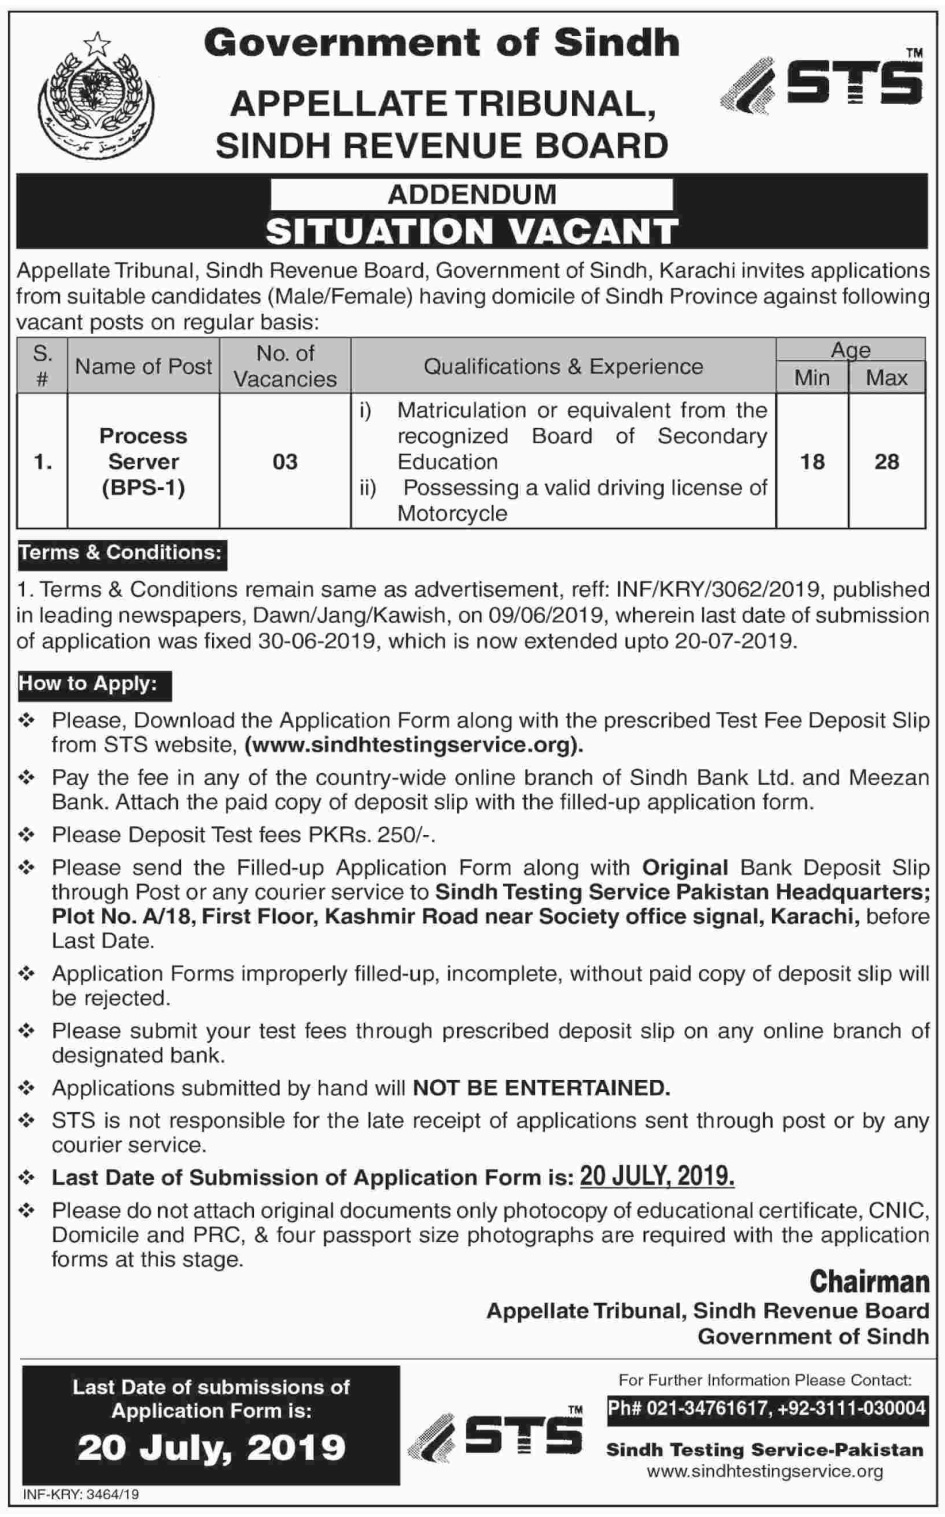 Appellate Tribunal Sindh Revenue Board Process Server Jobs June 2019